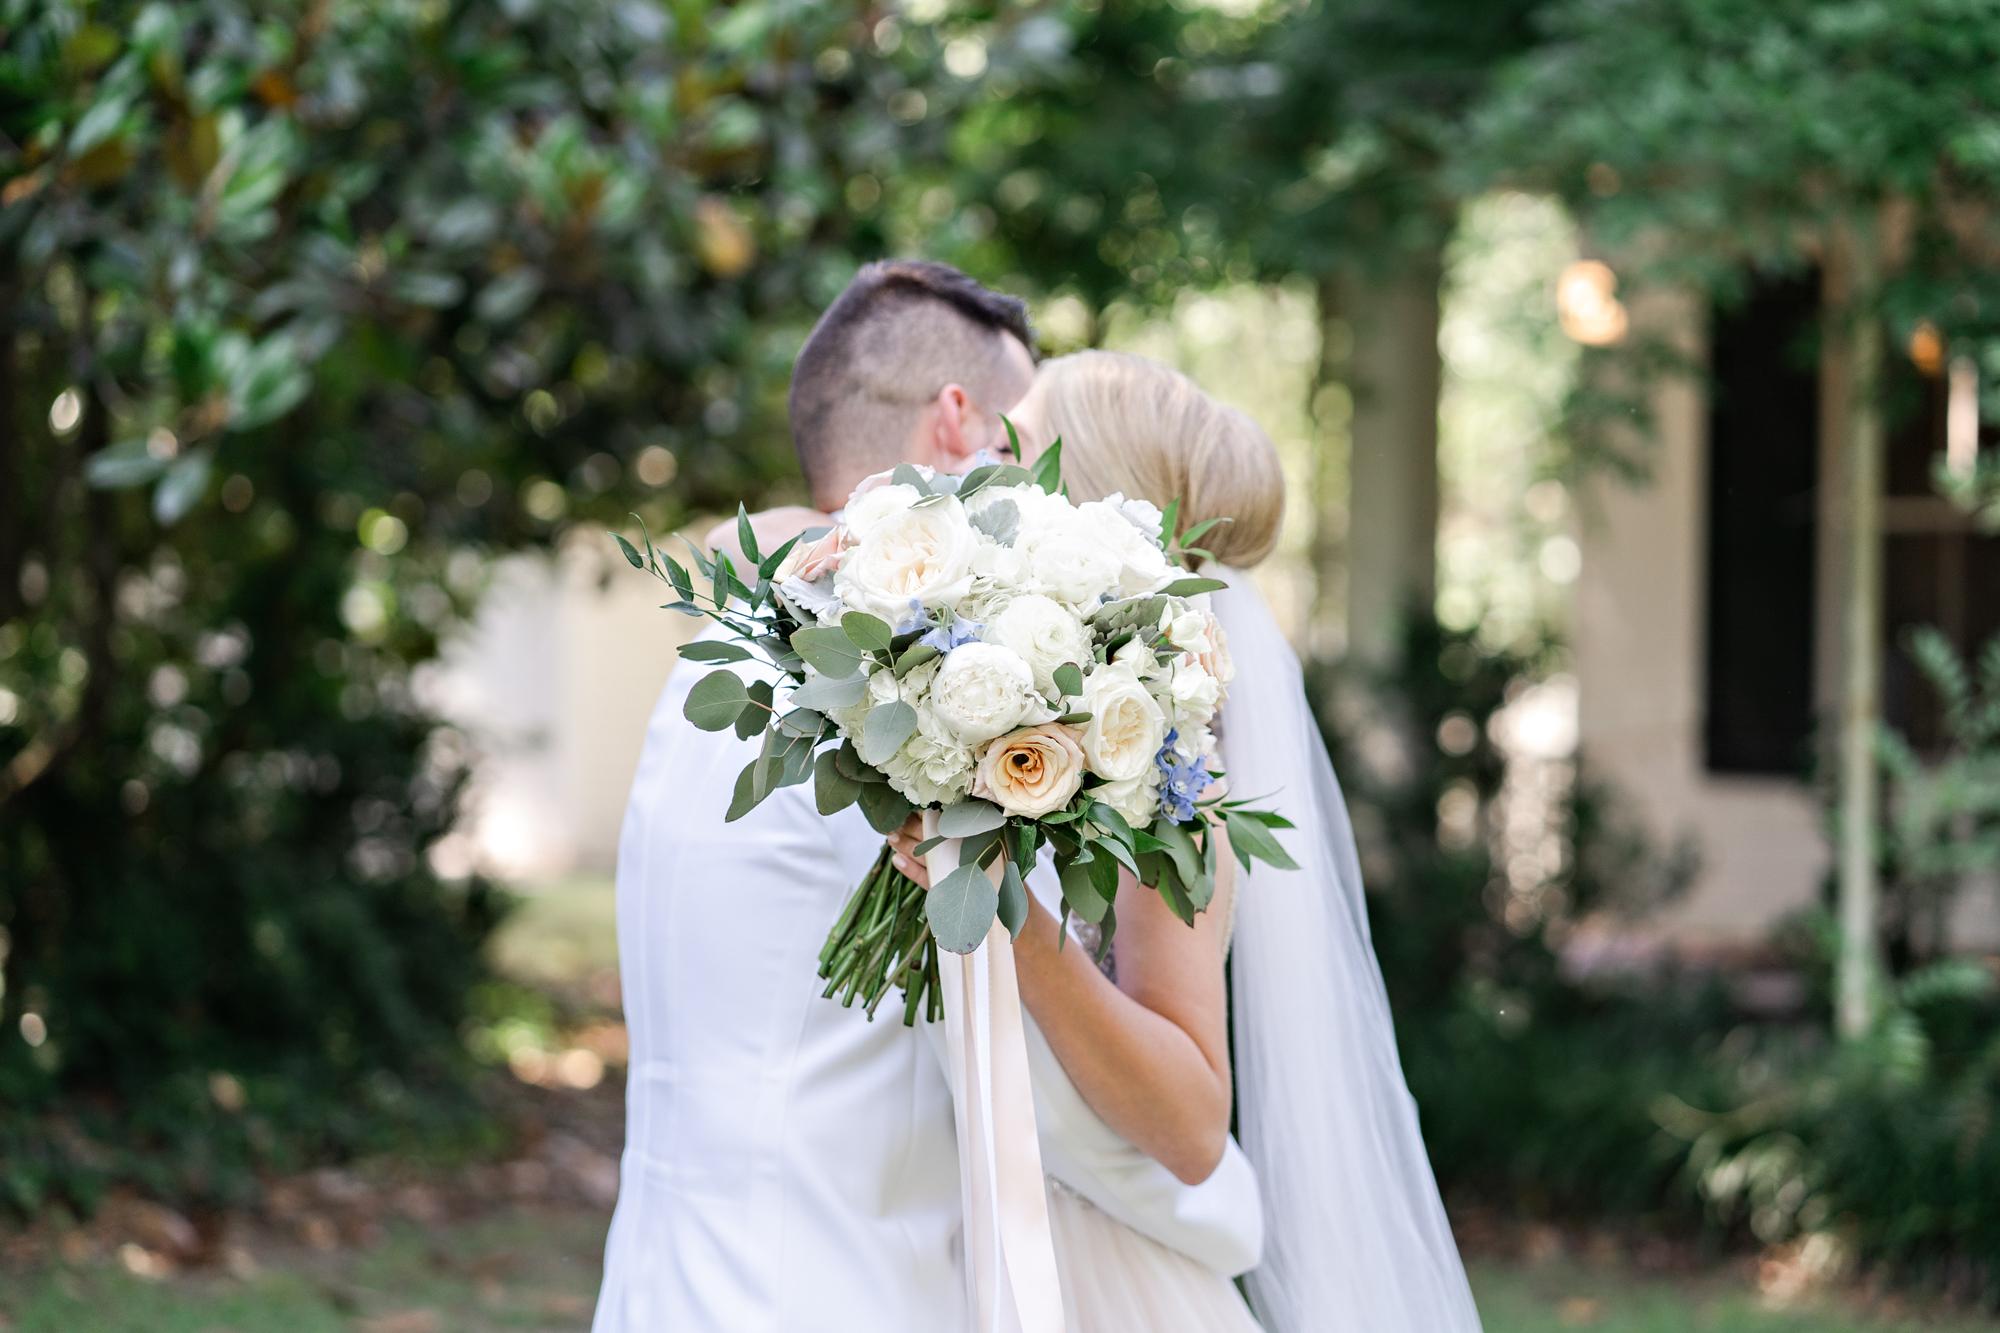 Alabama-Photographers-Nick-Drollette-Wedding-Photography-115.jpg